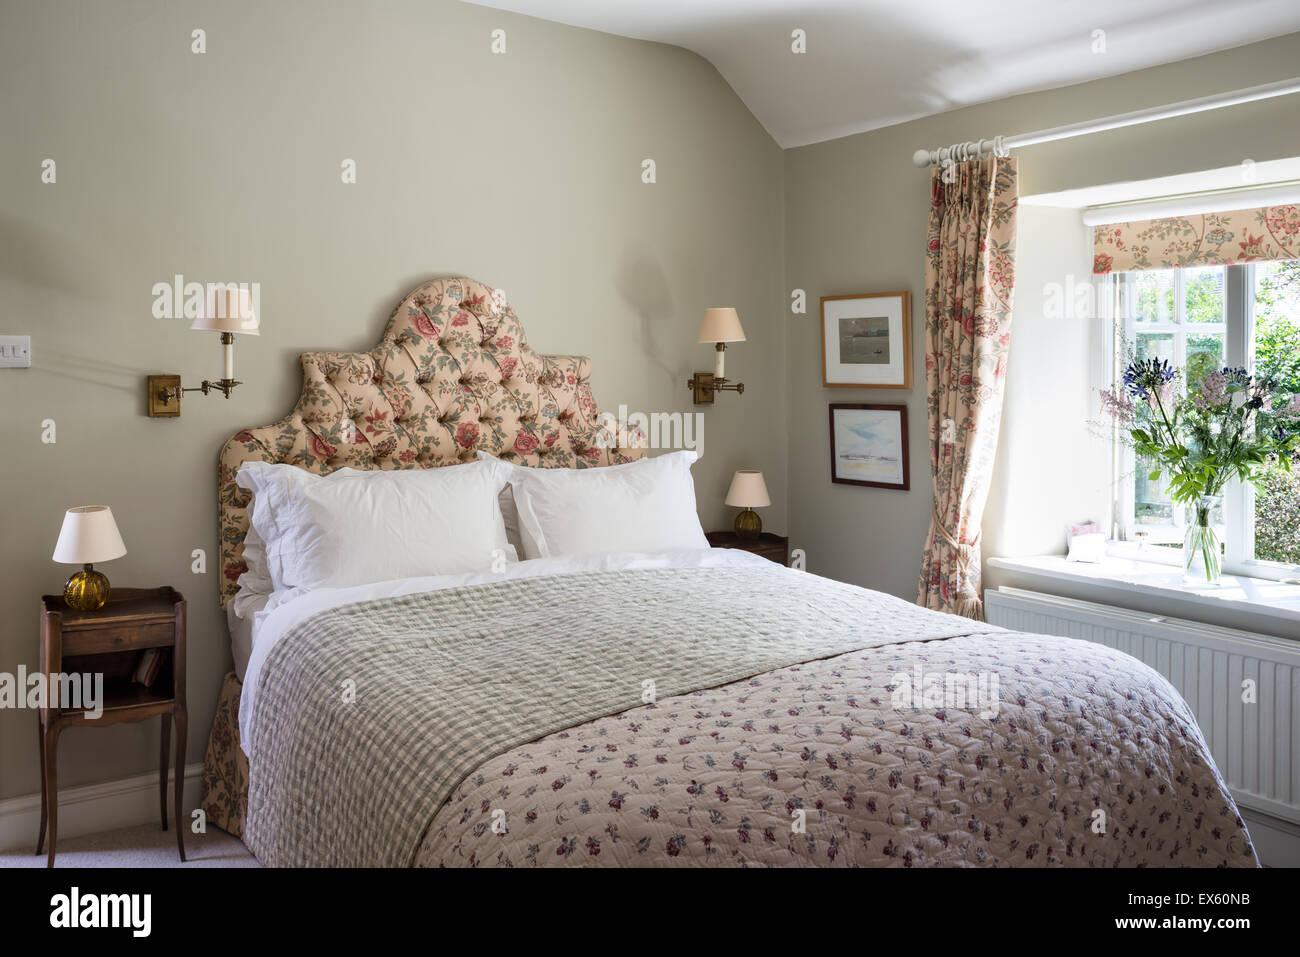 chelsea textilien quilt auf bett mit kopfteil in bennisons shangri la stoff gepolstert stockfoto. Black Bedroom Furniture Sets. Home Design Ideas